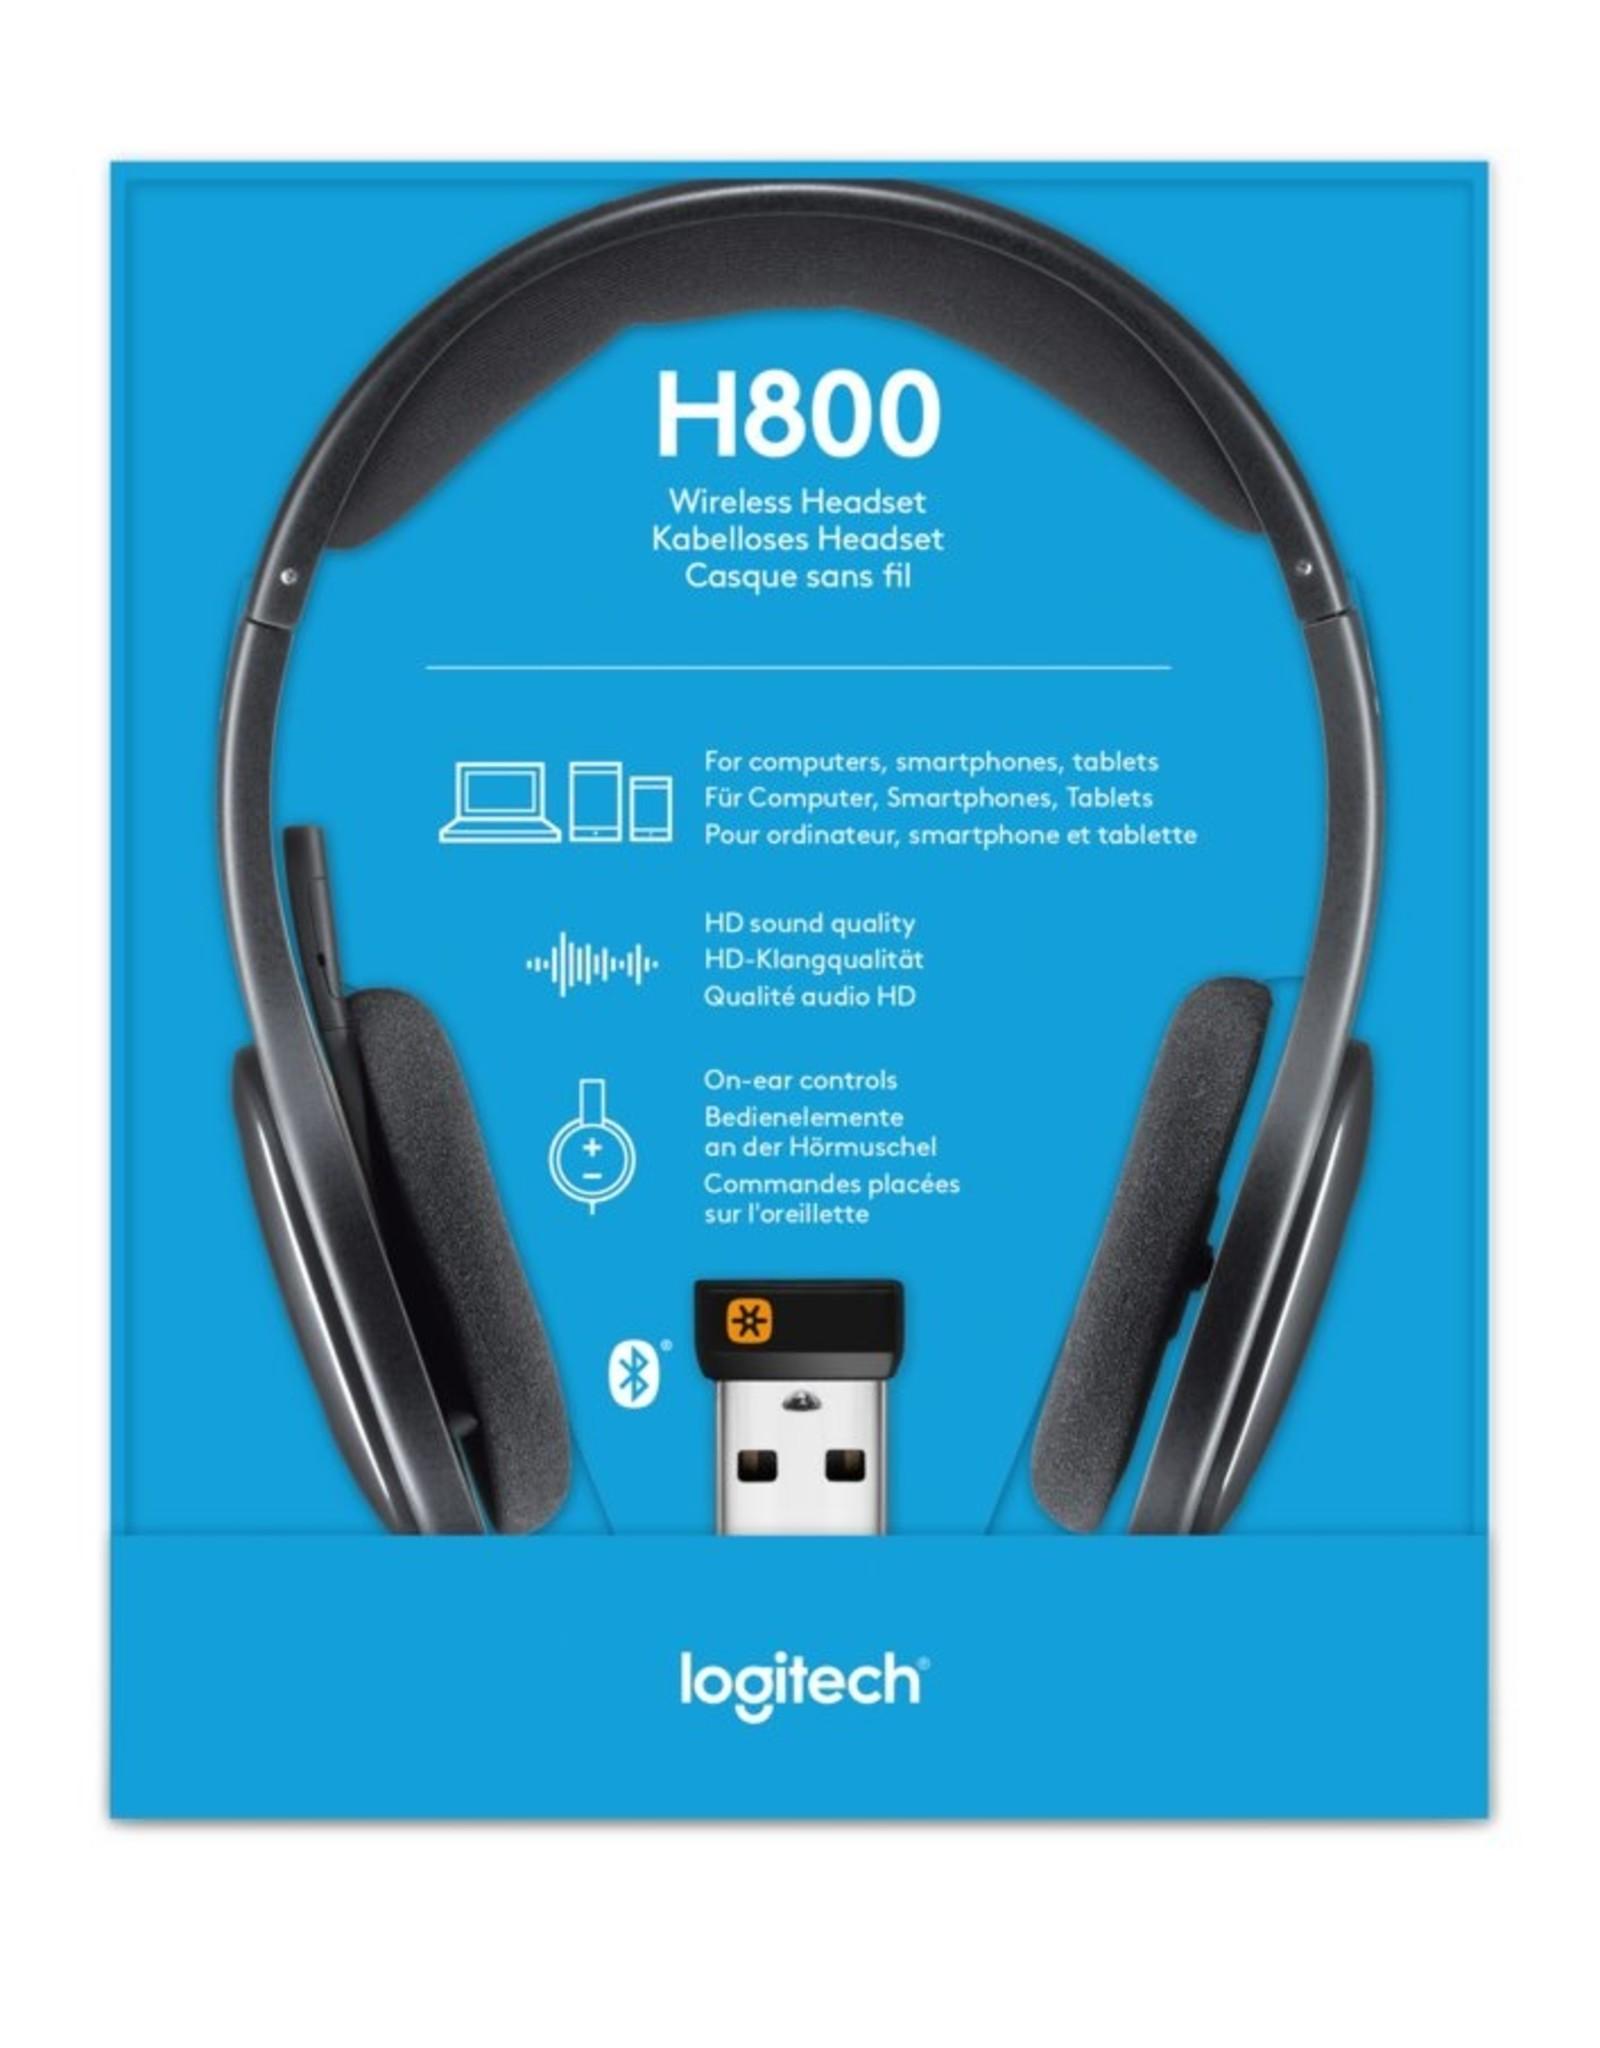 H800 Wireless Headset